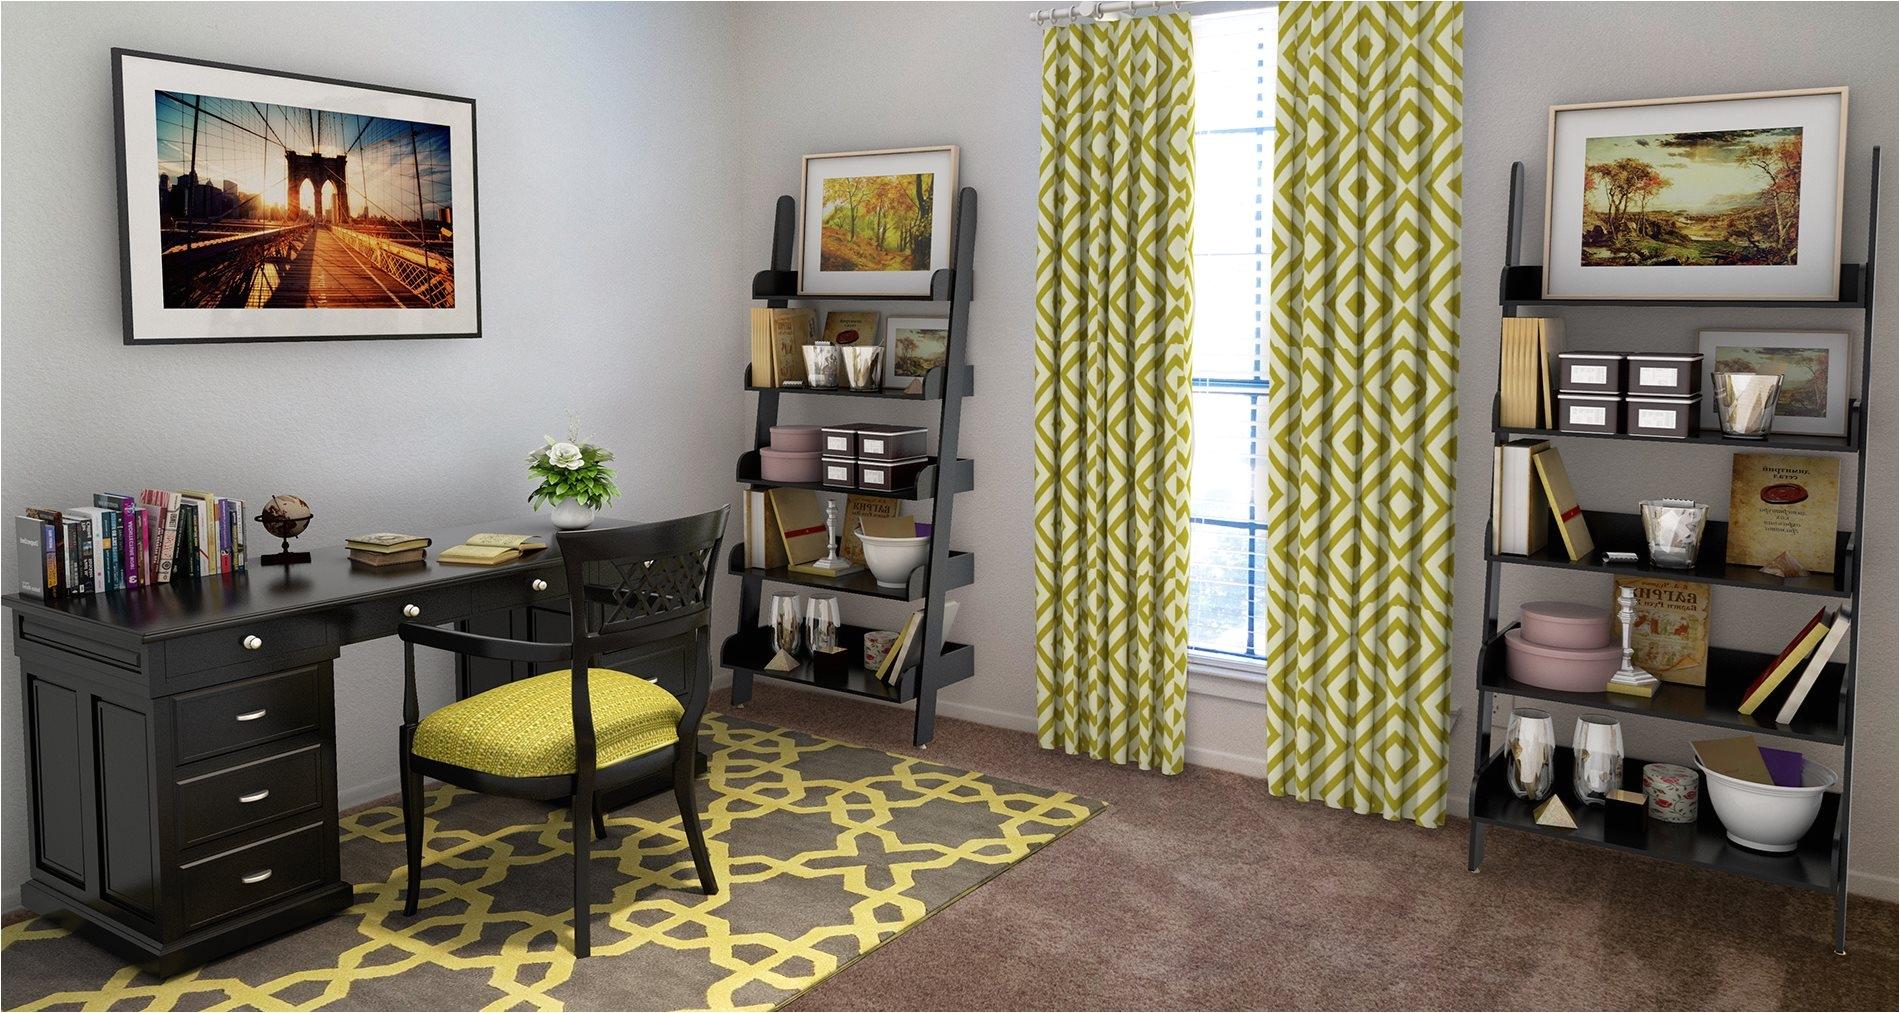 bedroom model background at ridgecrest apartments in denton texas tx